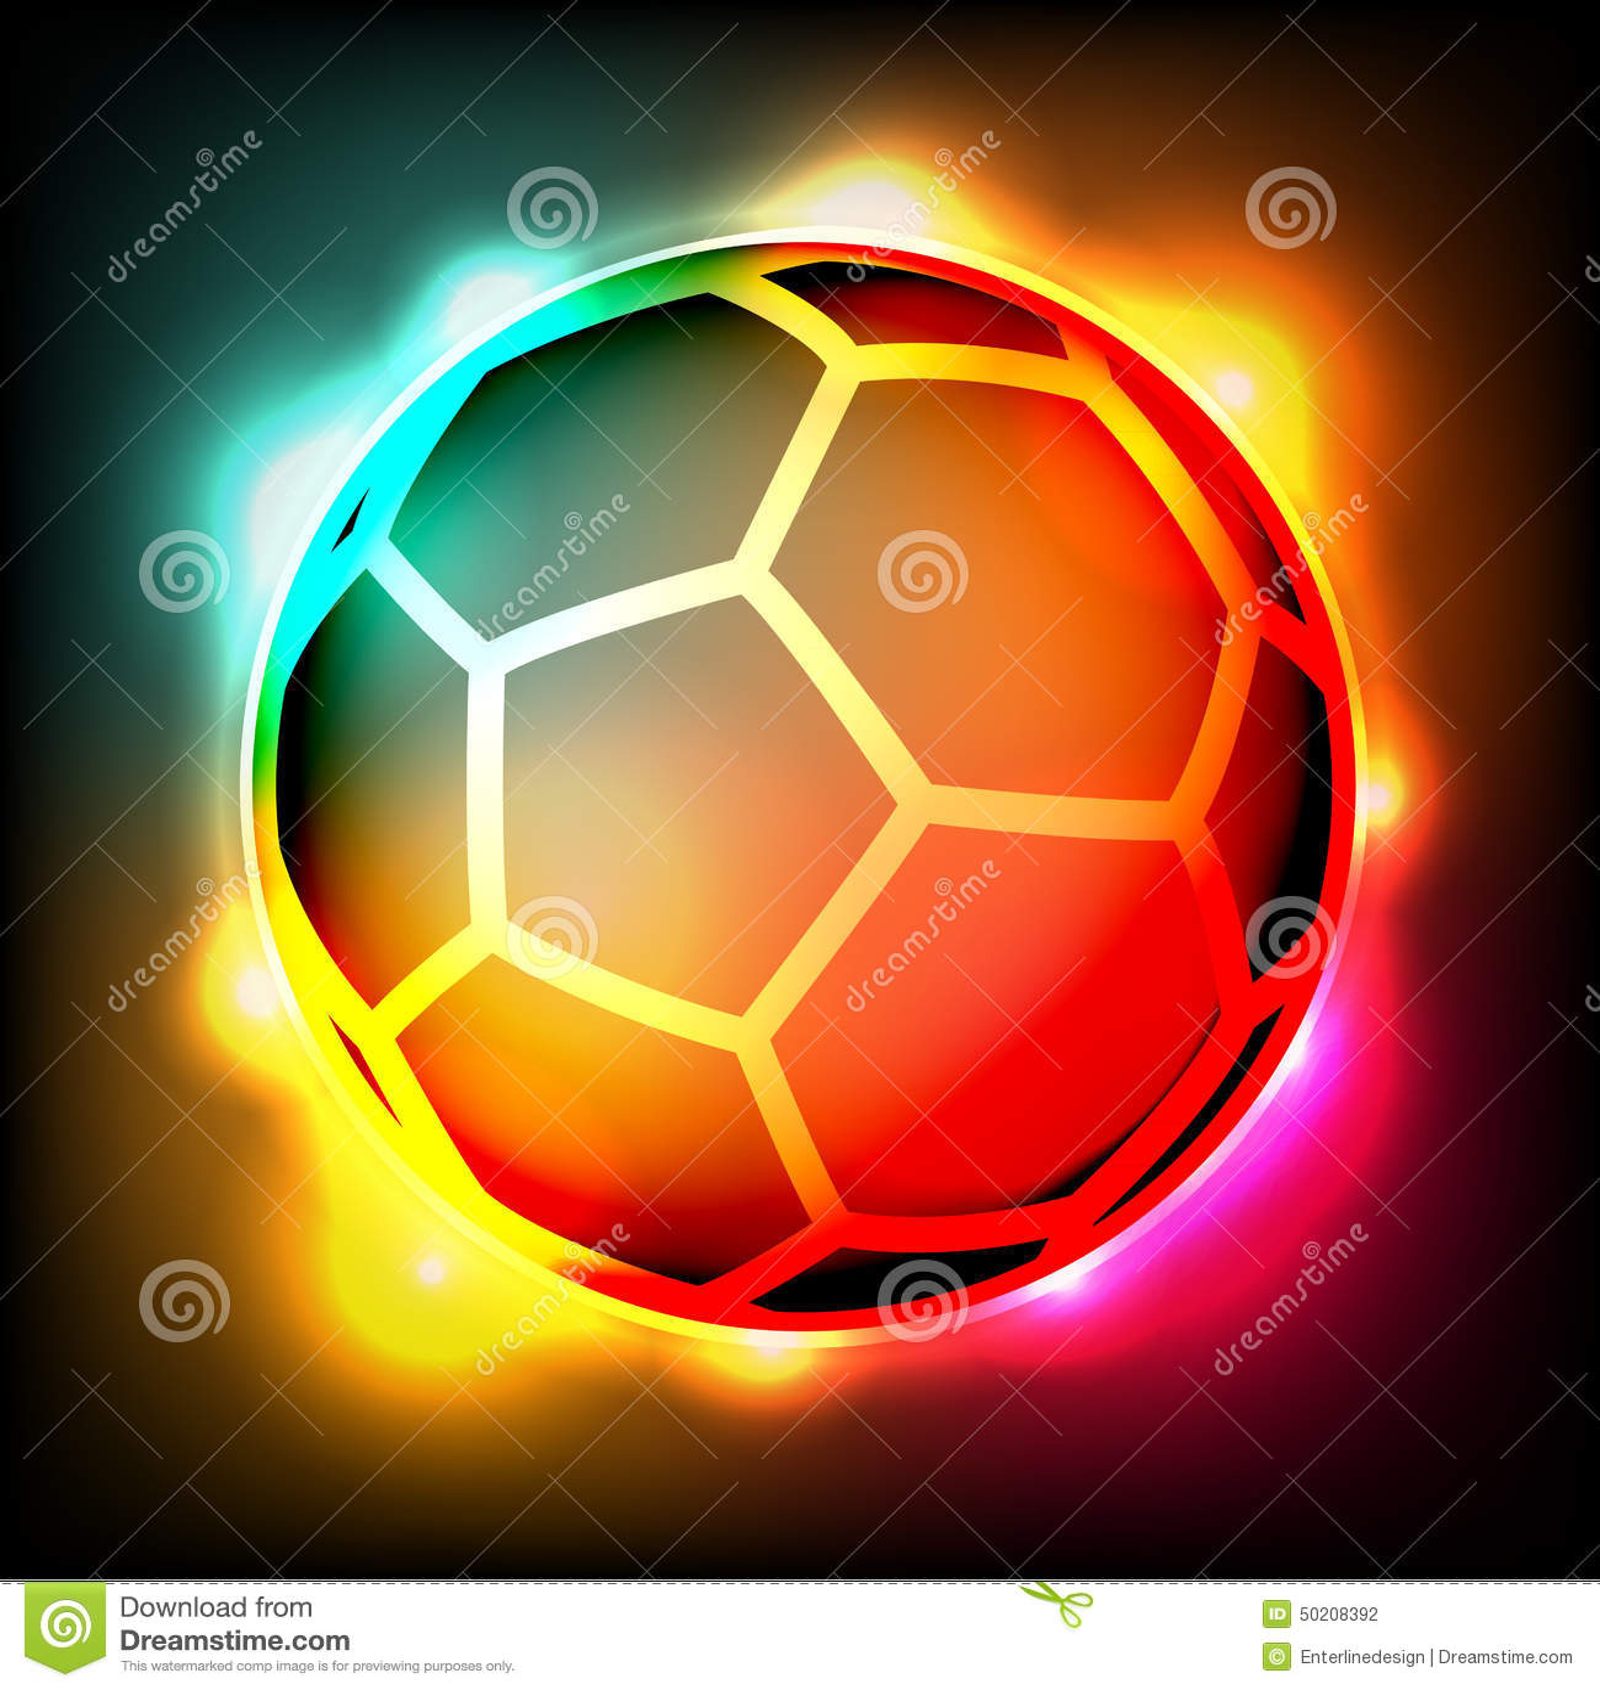 Soccer Ball Football Colorful Lights Illustration Stock Vector ...